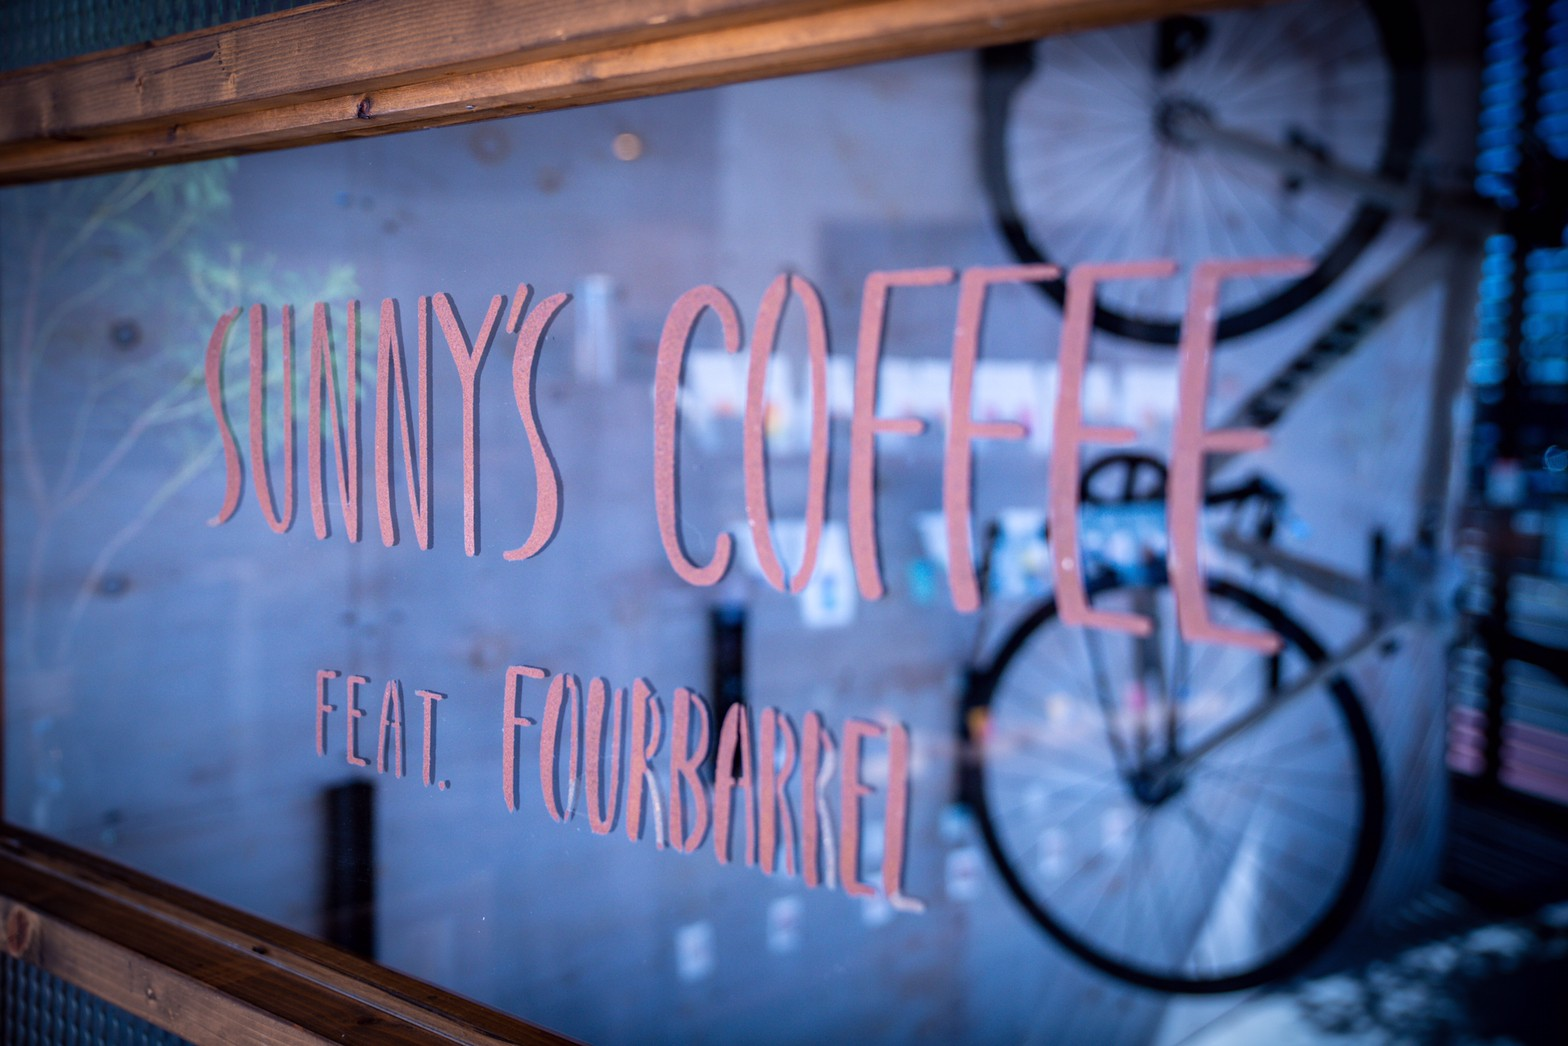 Sunny`s Coffee